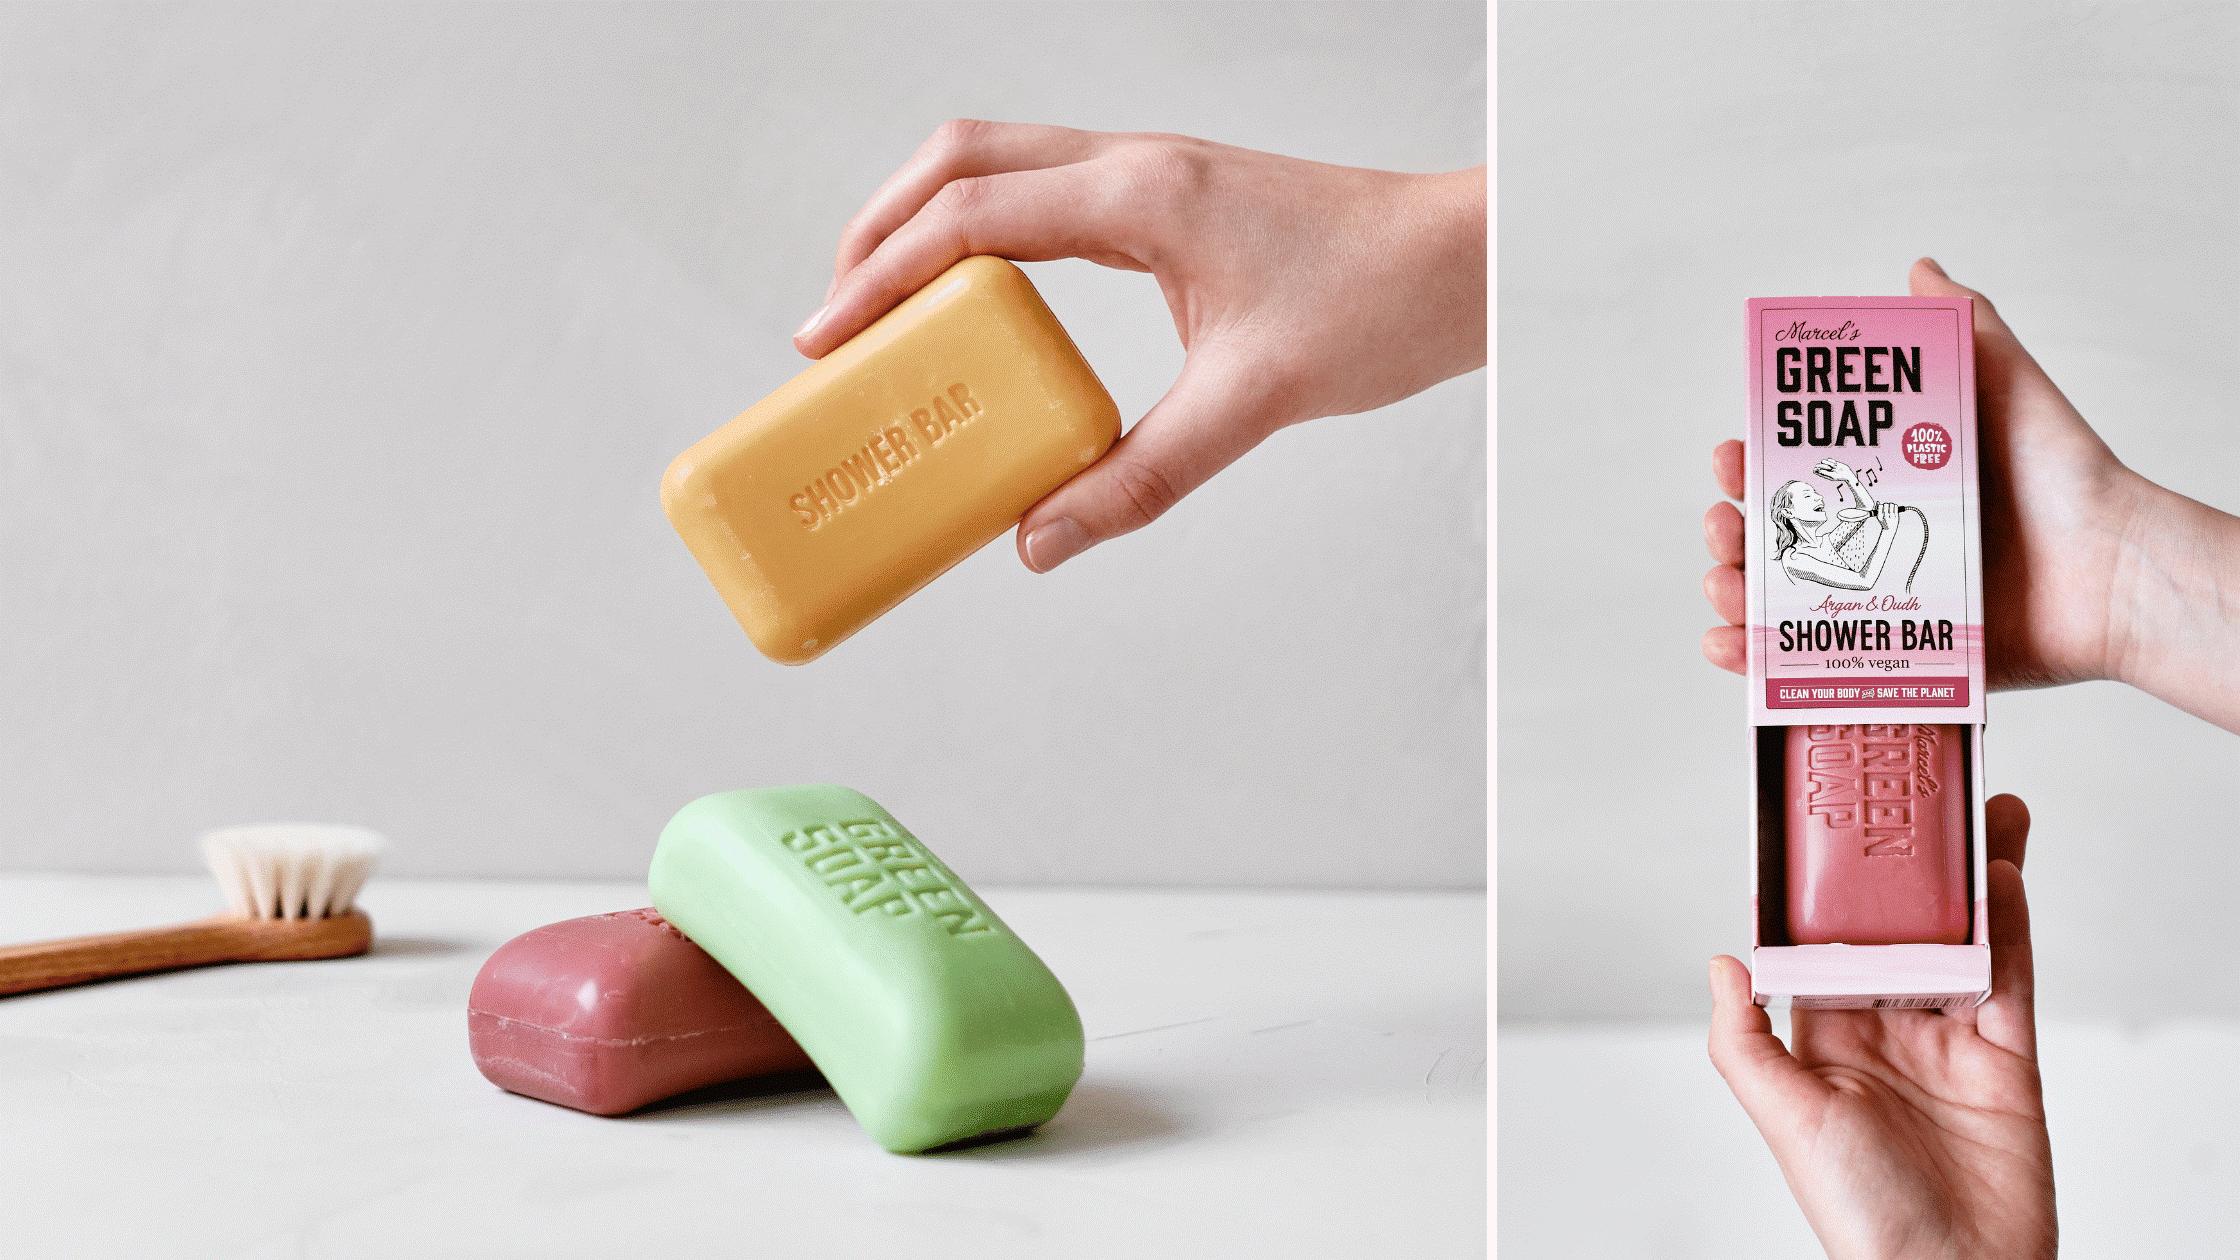 Marcel's green soap plastic vrije bar